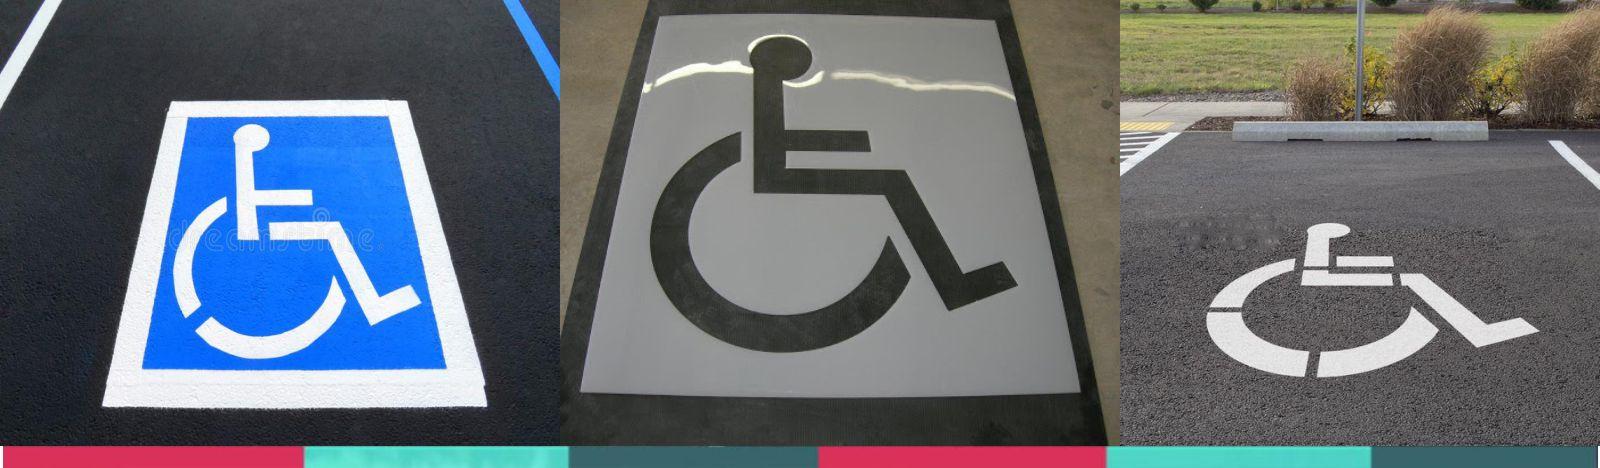 stencils for handicap parking - precision cutting services-1